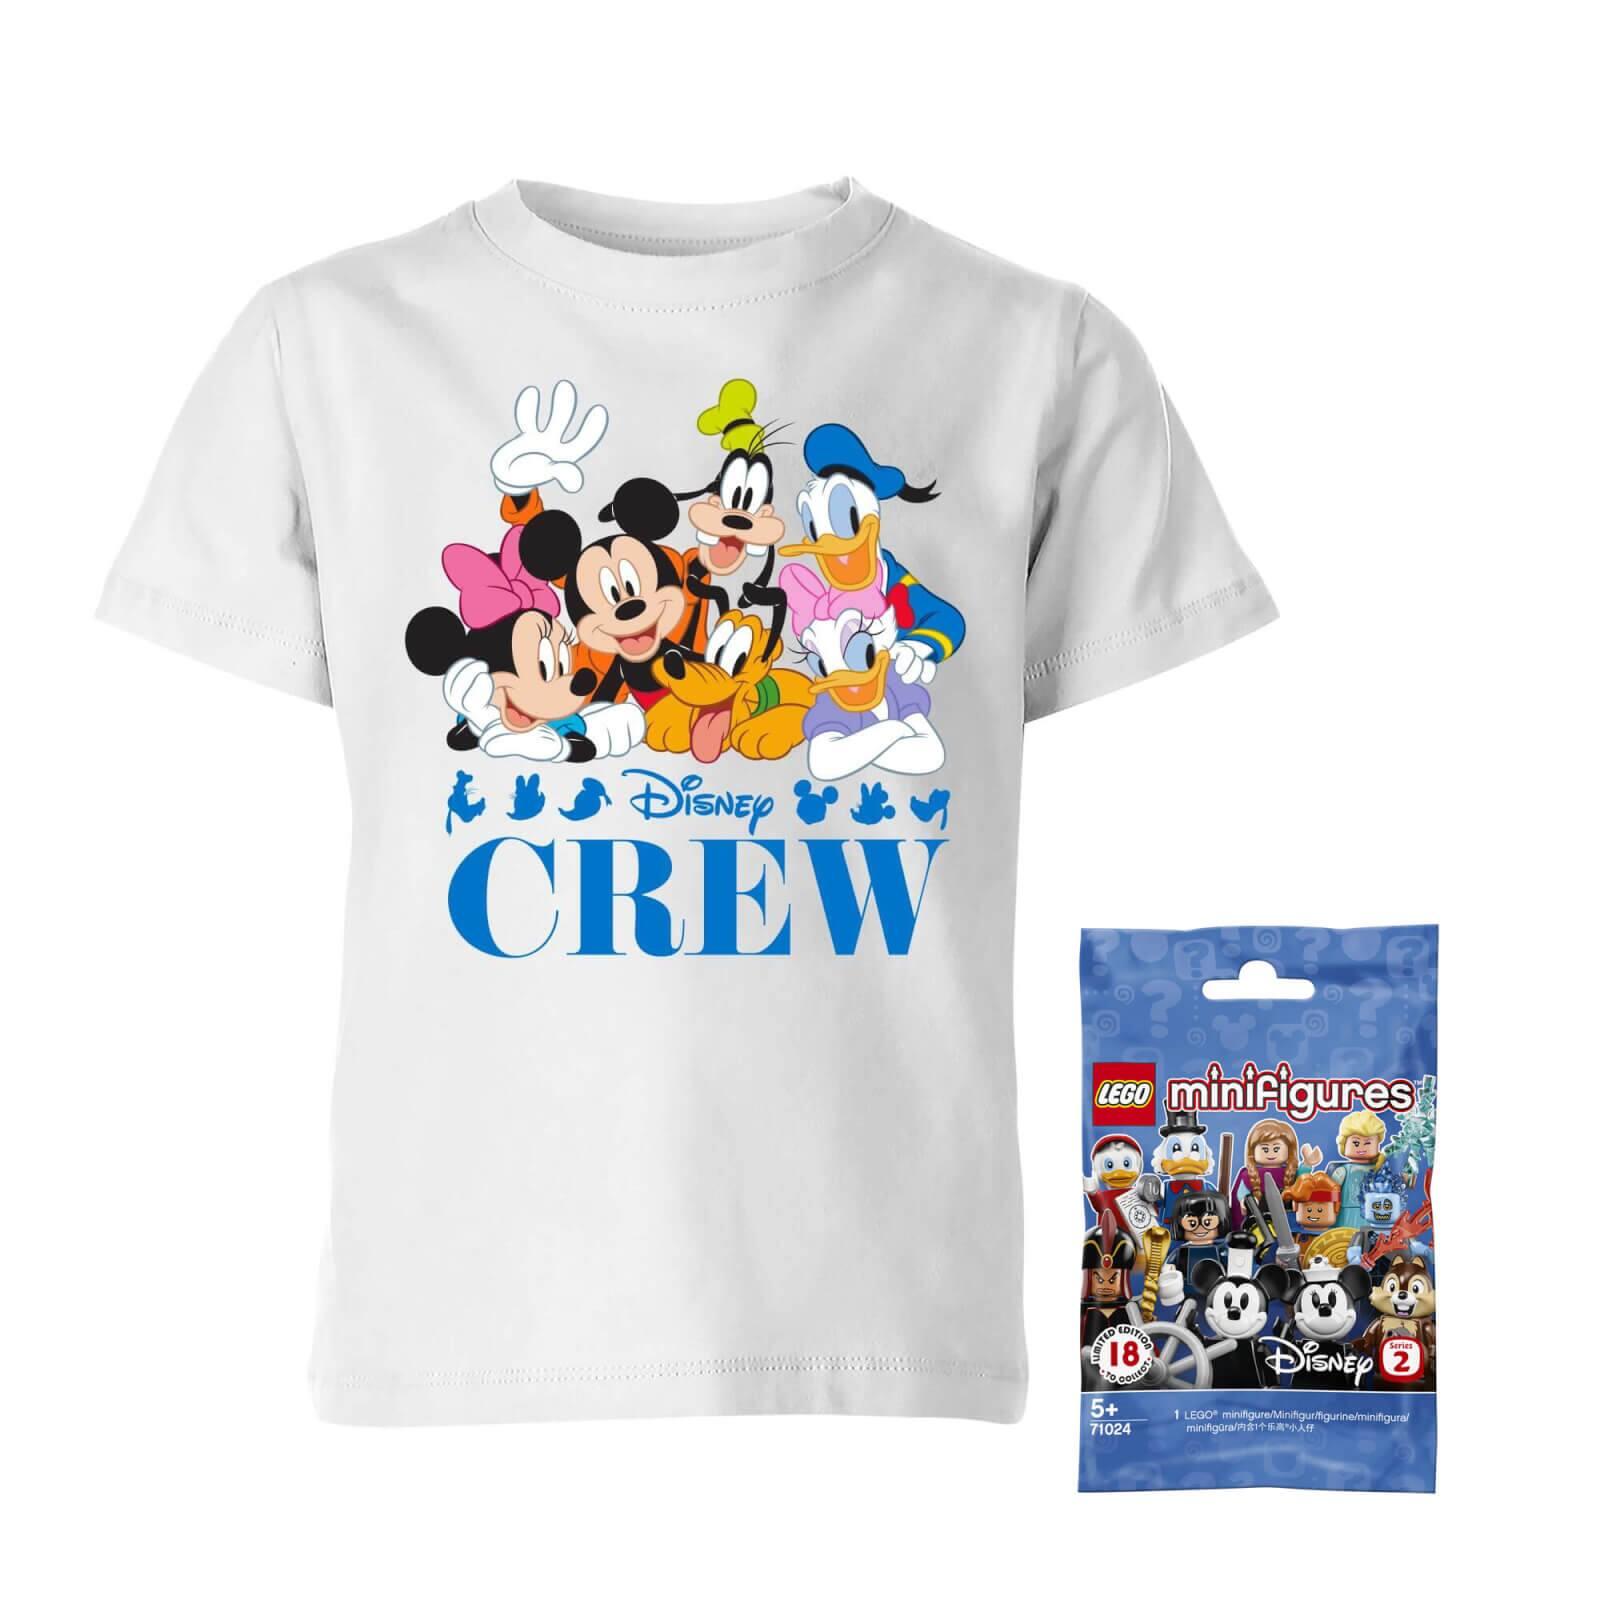 Disney Tee & LEGO Minifigure Bundle $12.99 + Free Shipping